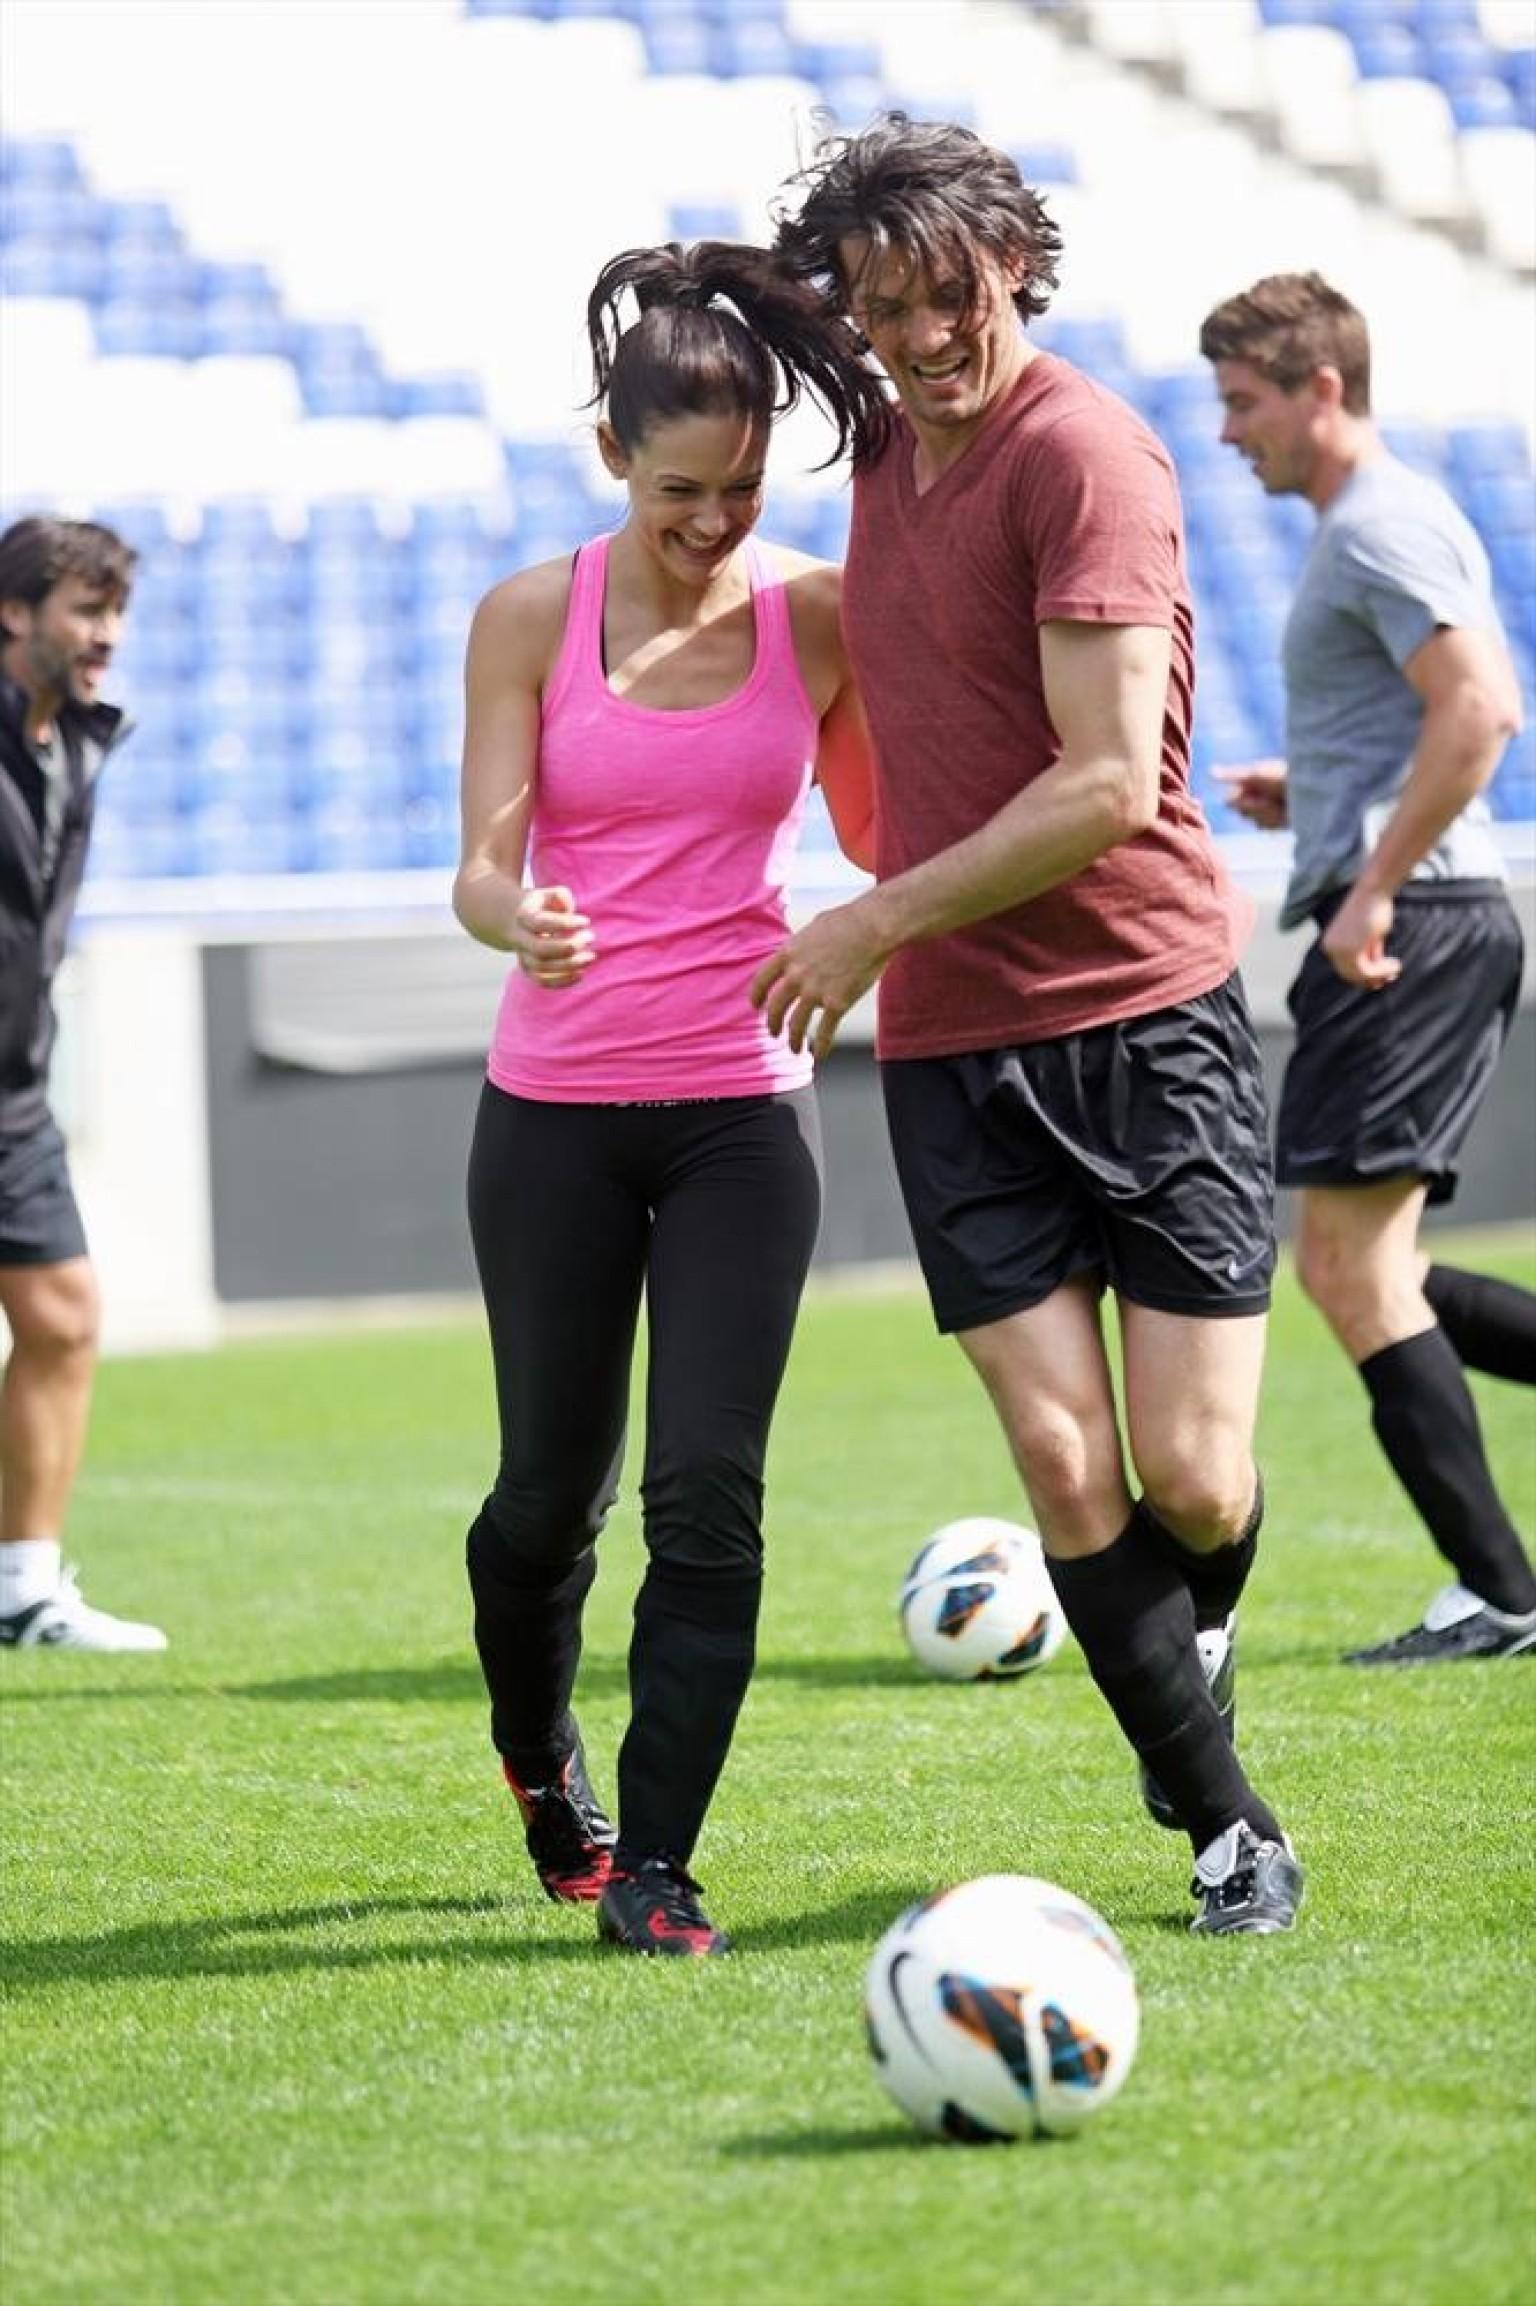 The Bachelorette Season 9 Episode 6 Desiree Hartsock Plays Soccer Kicks James To Curb